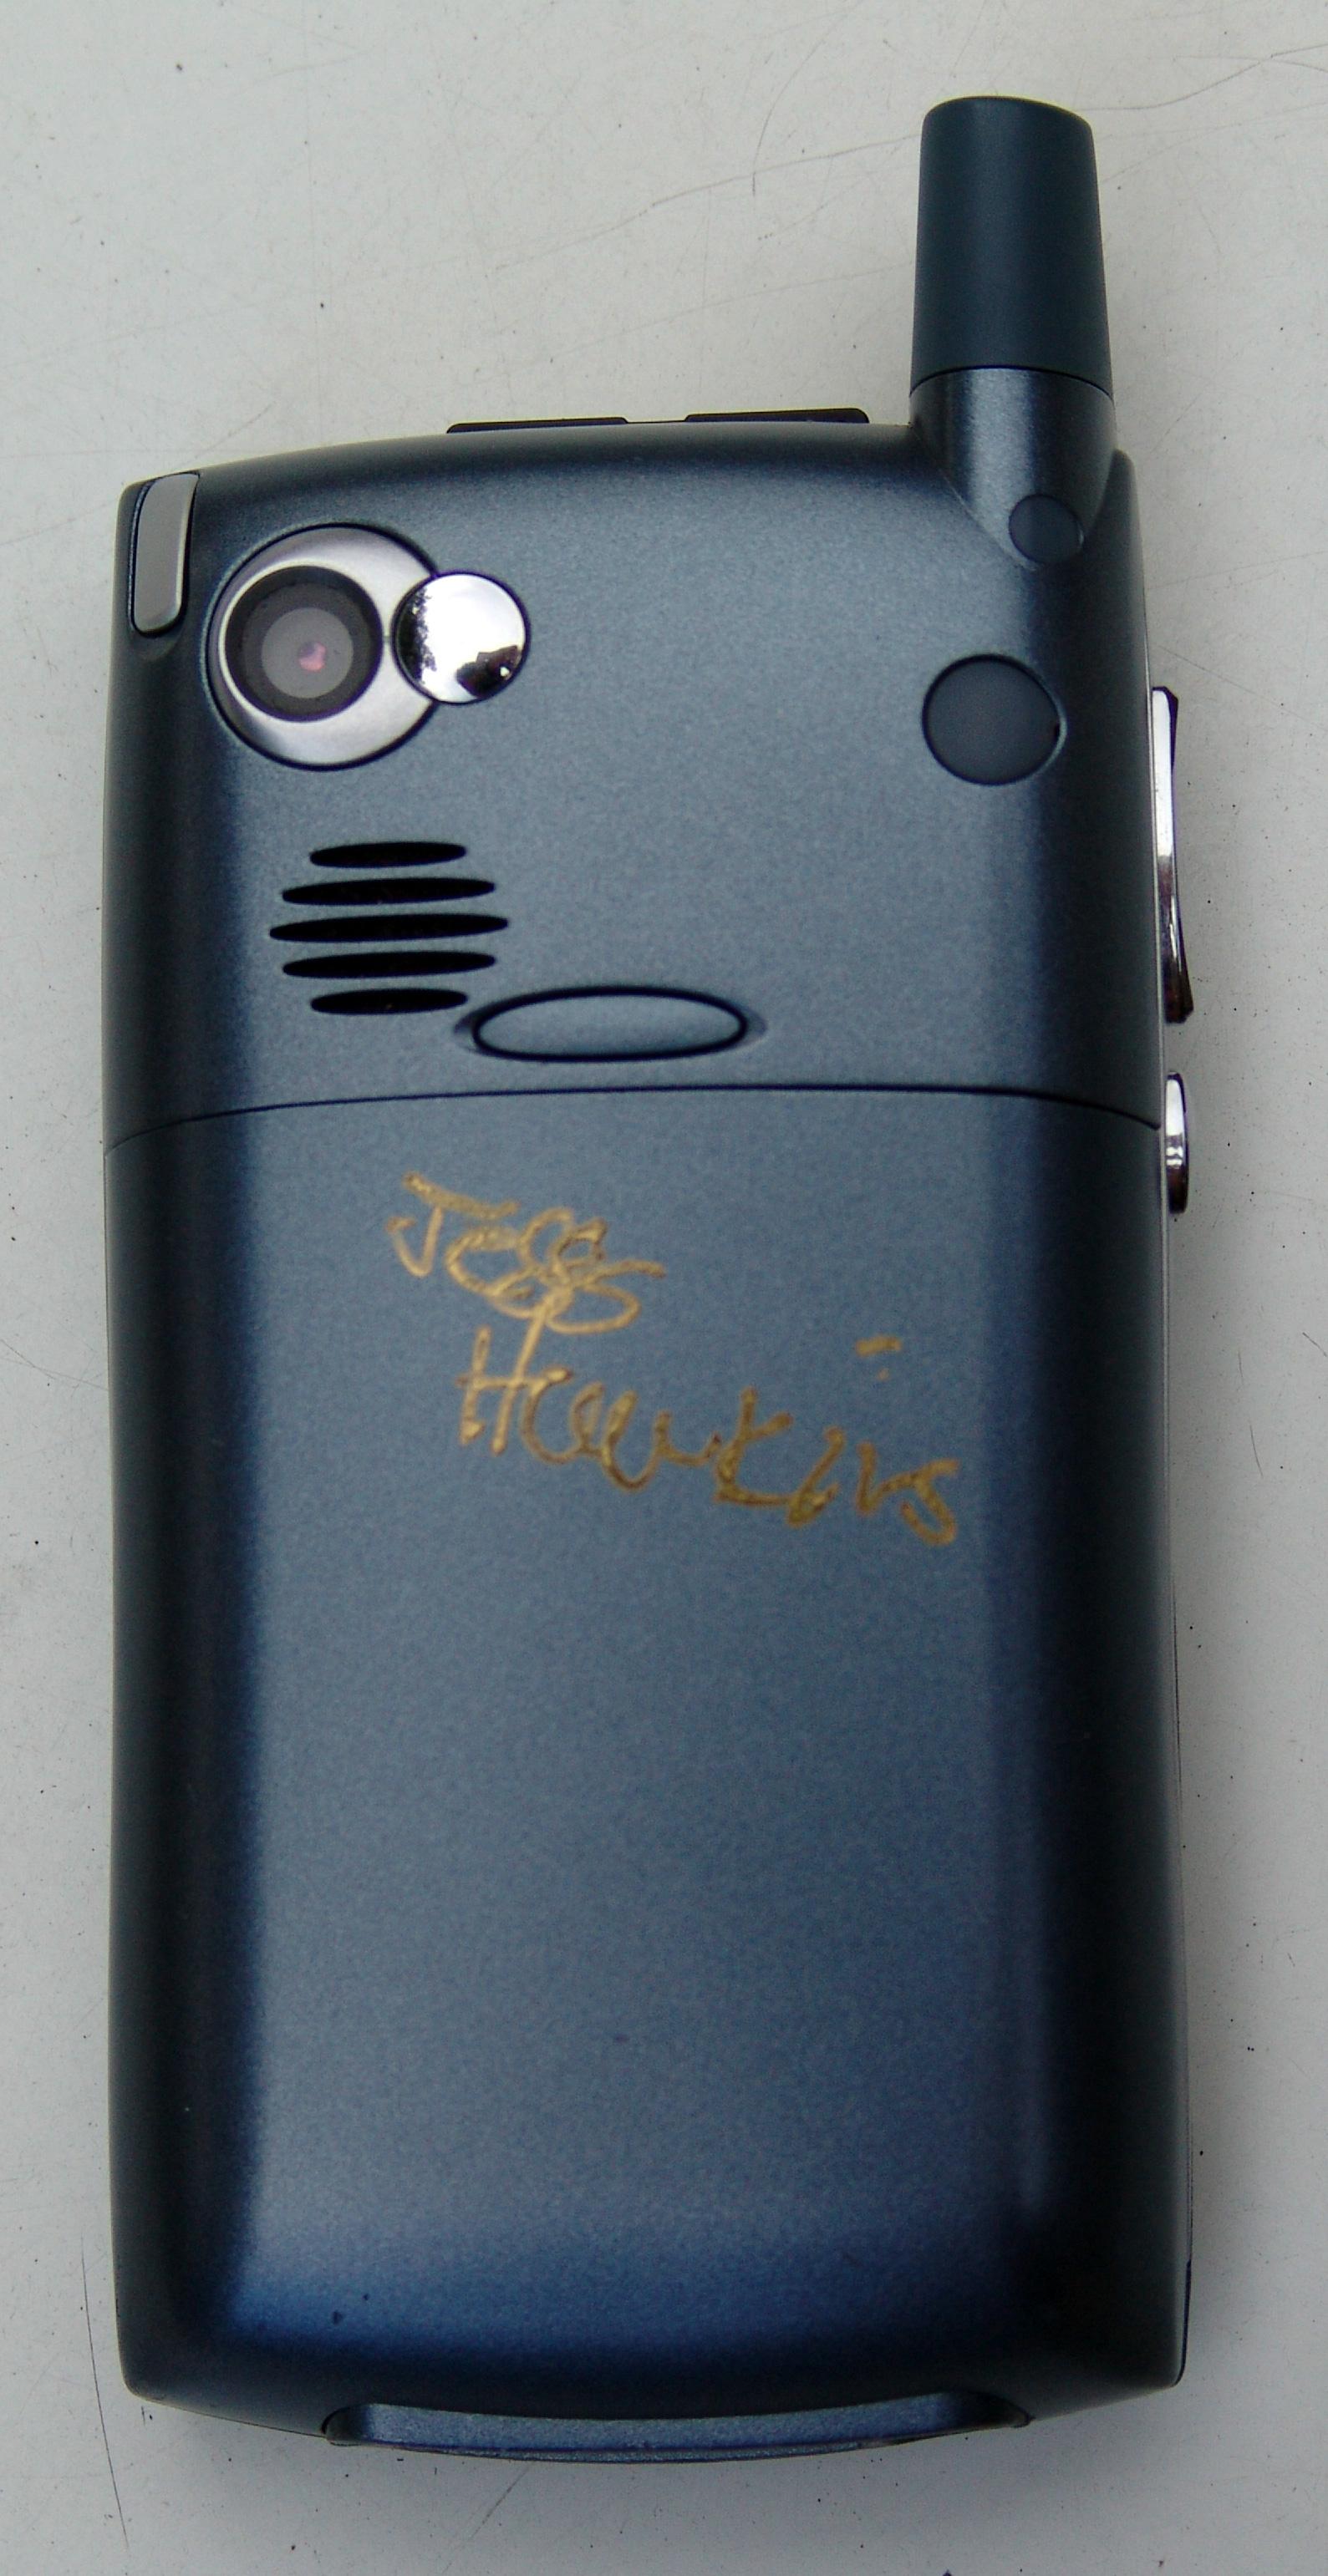 My signed Treo 650